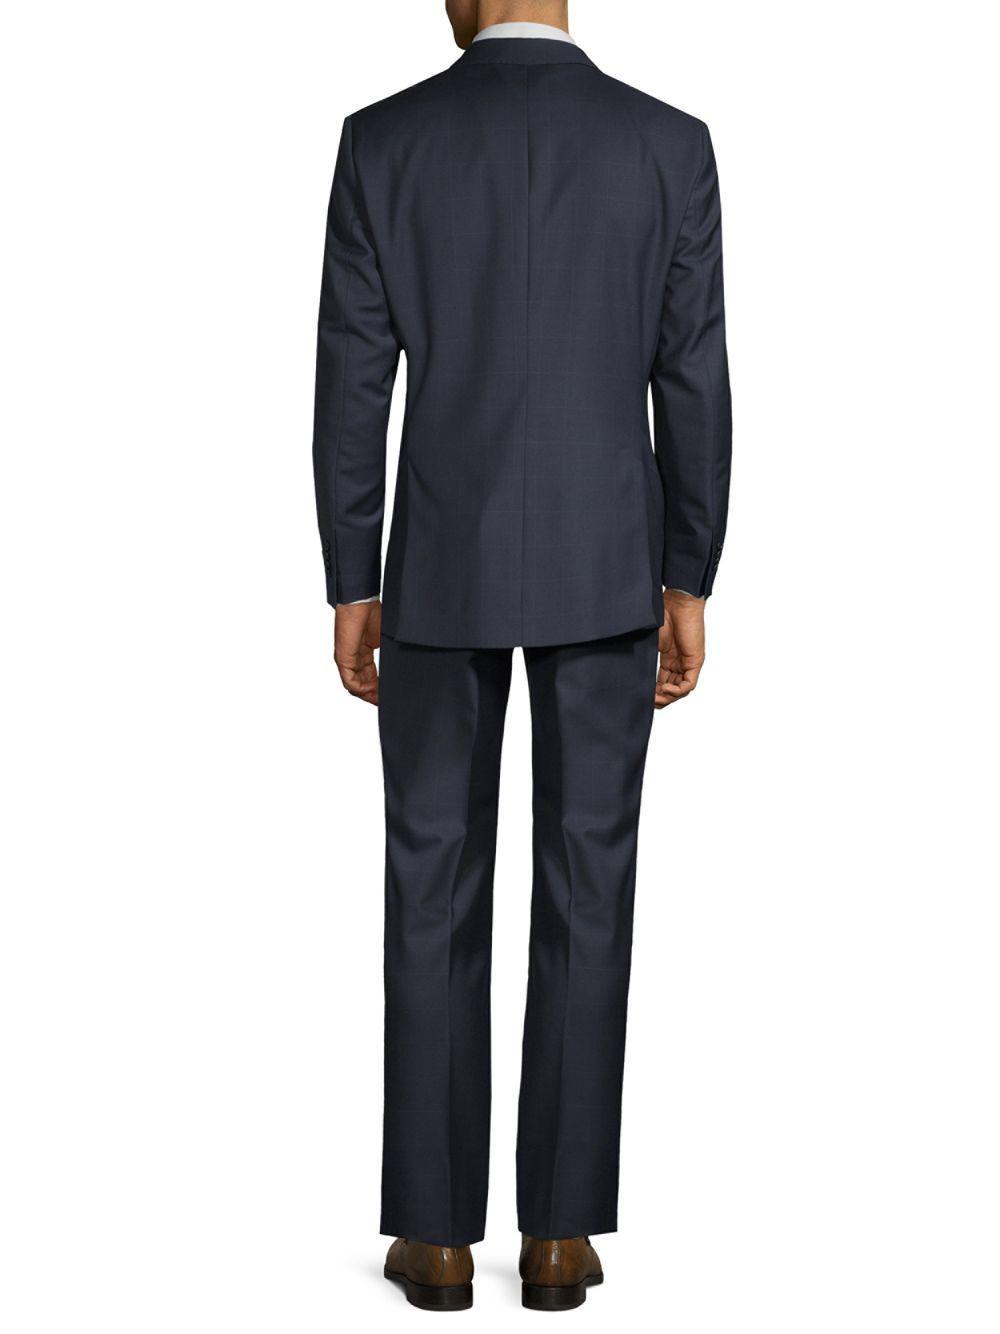 Saks Fifth Avenue Wool Windowpane Suit in Navy (Blue) for Men